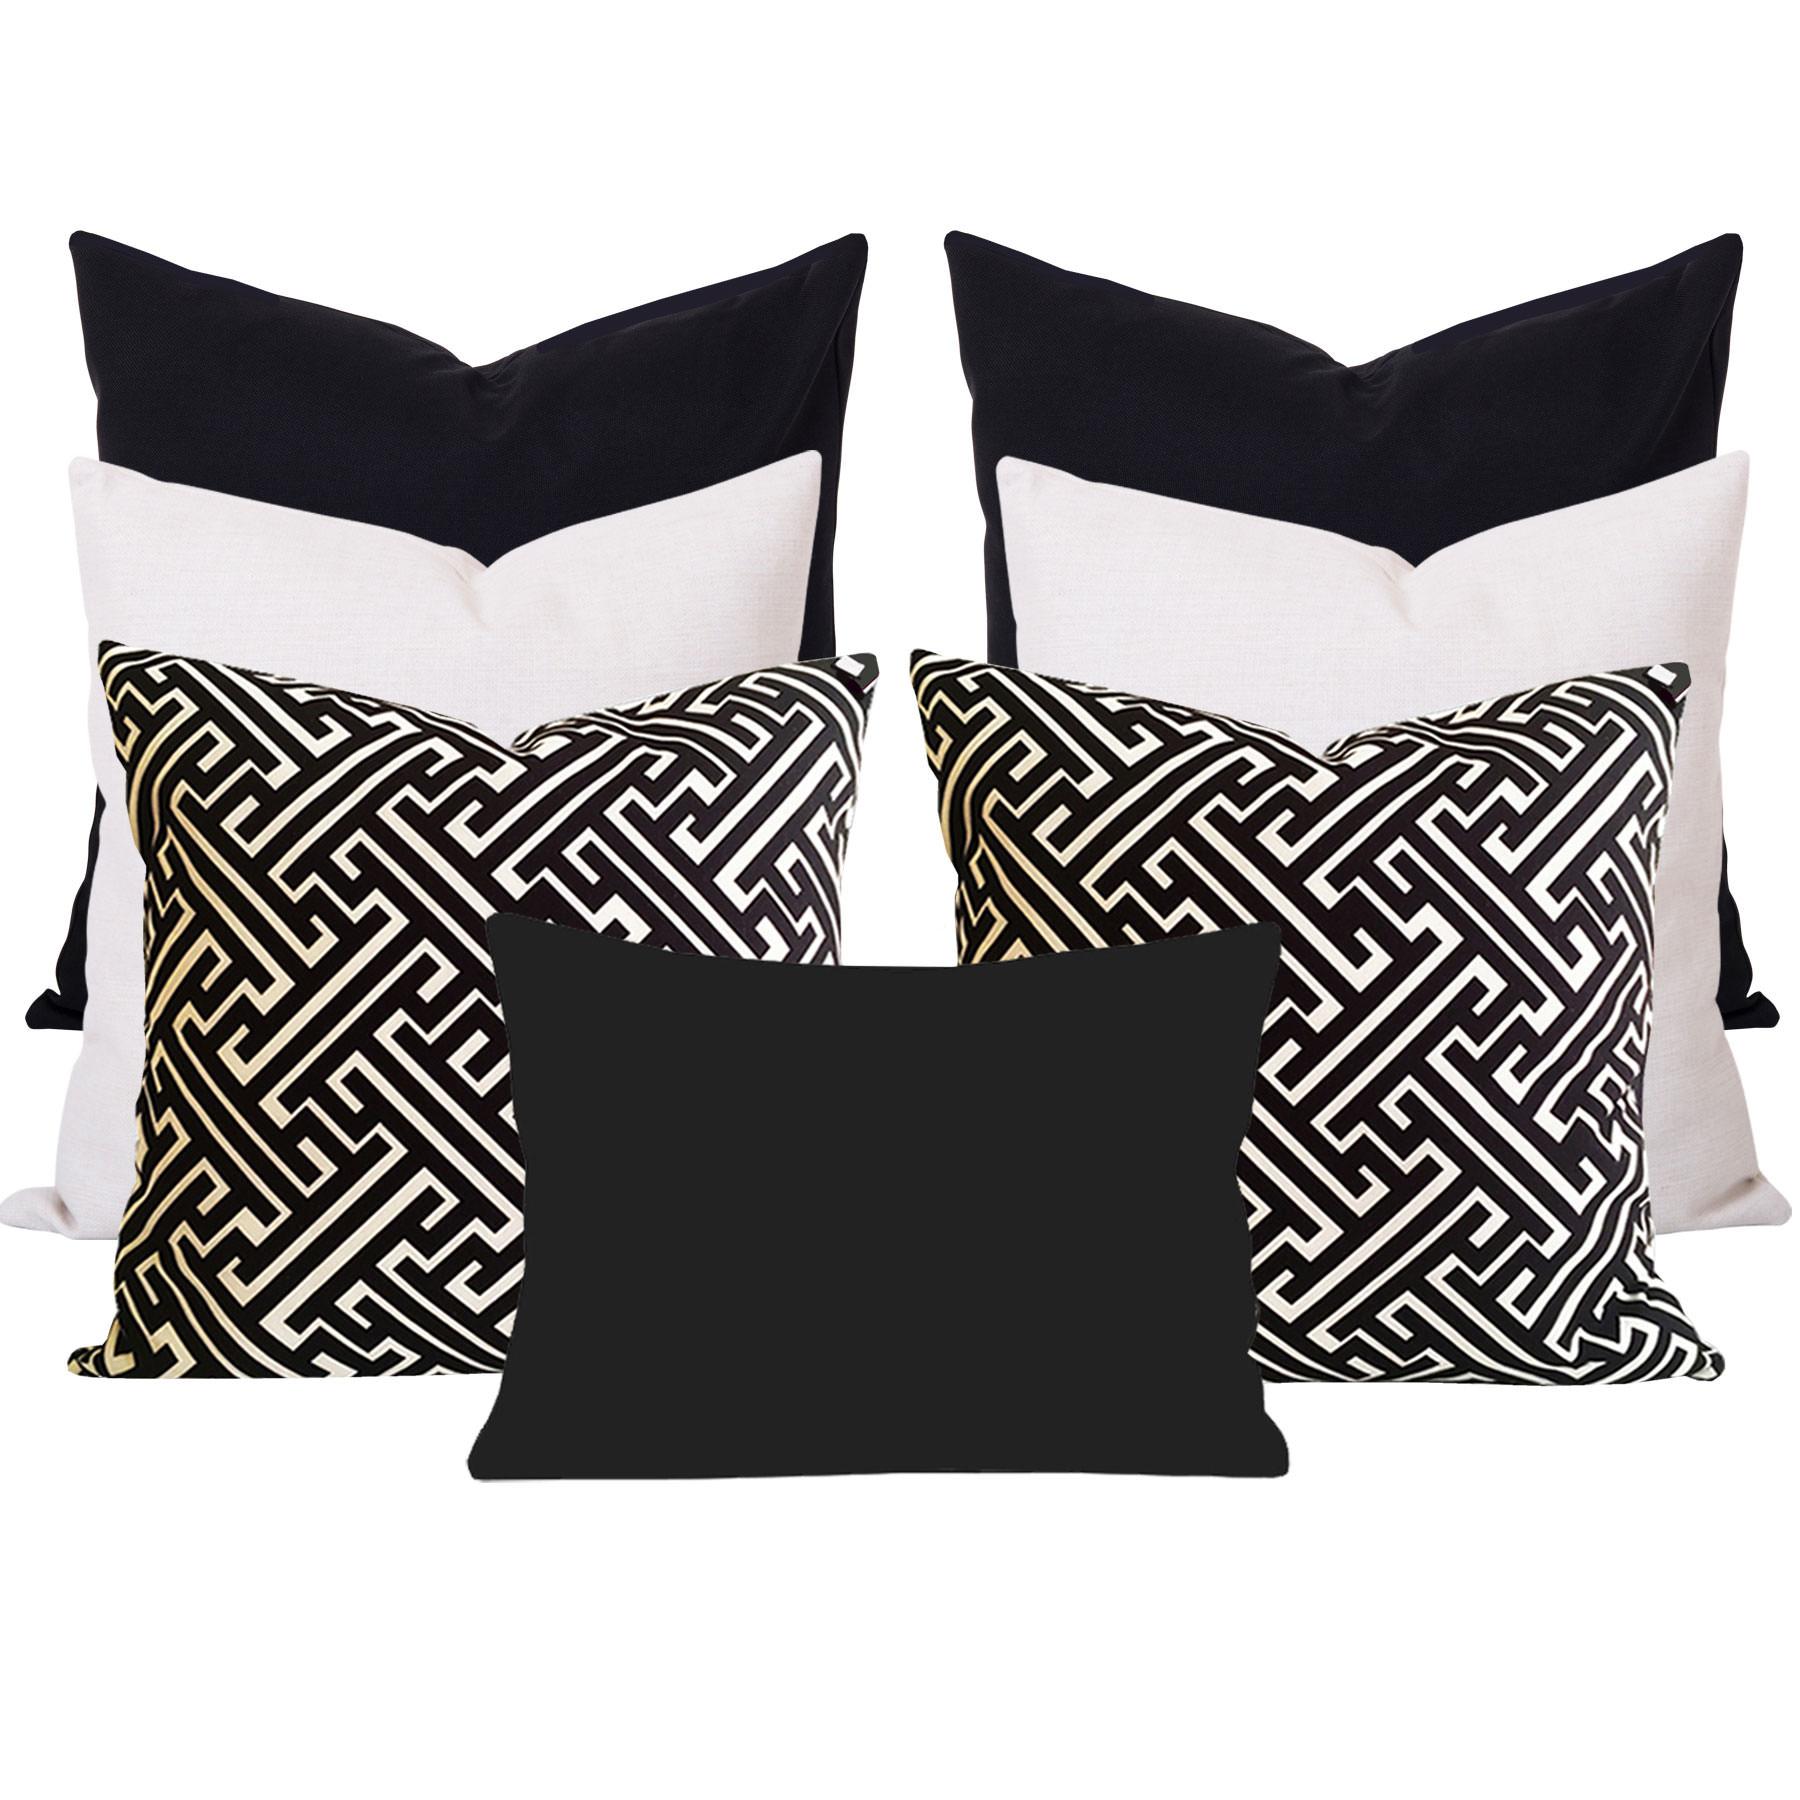 Georgia-Maze-Black-7-Cushion-Set